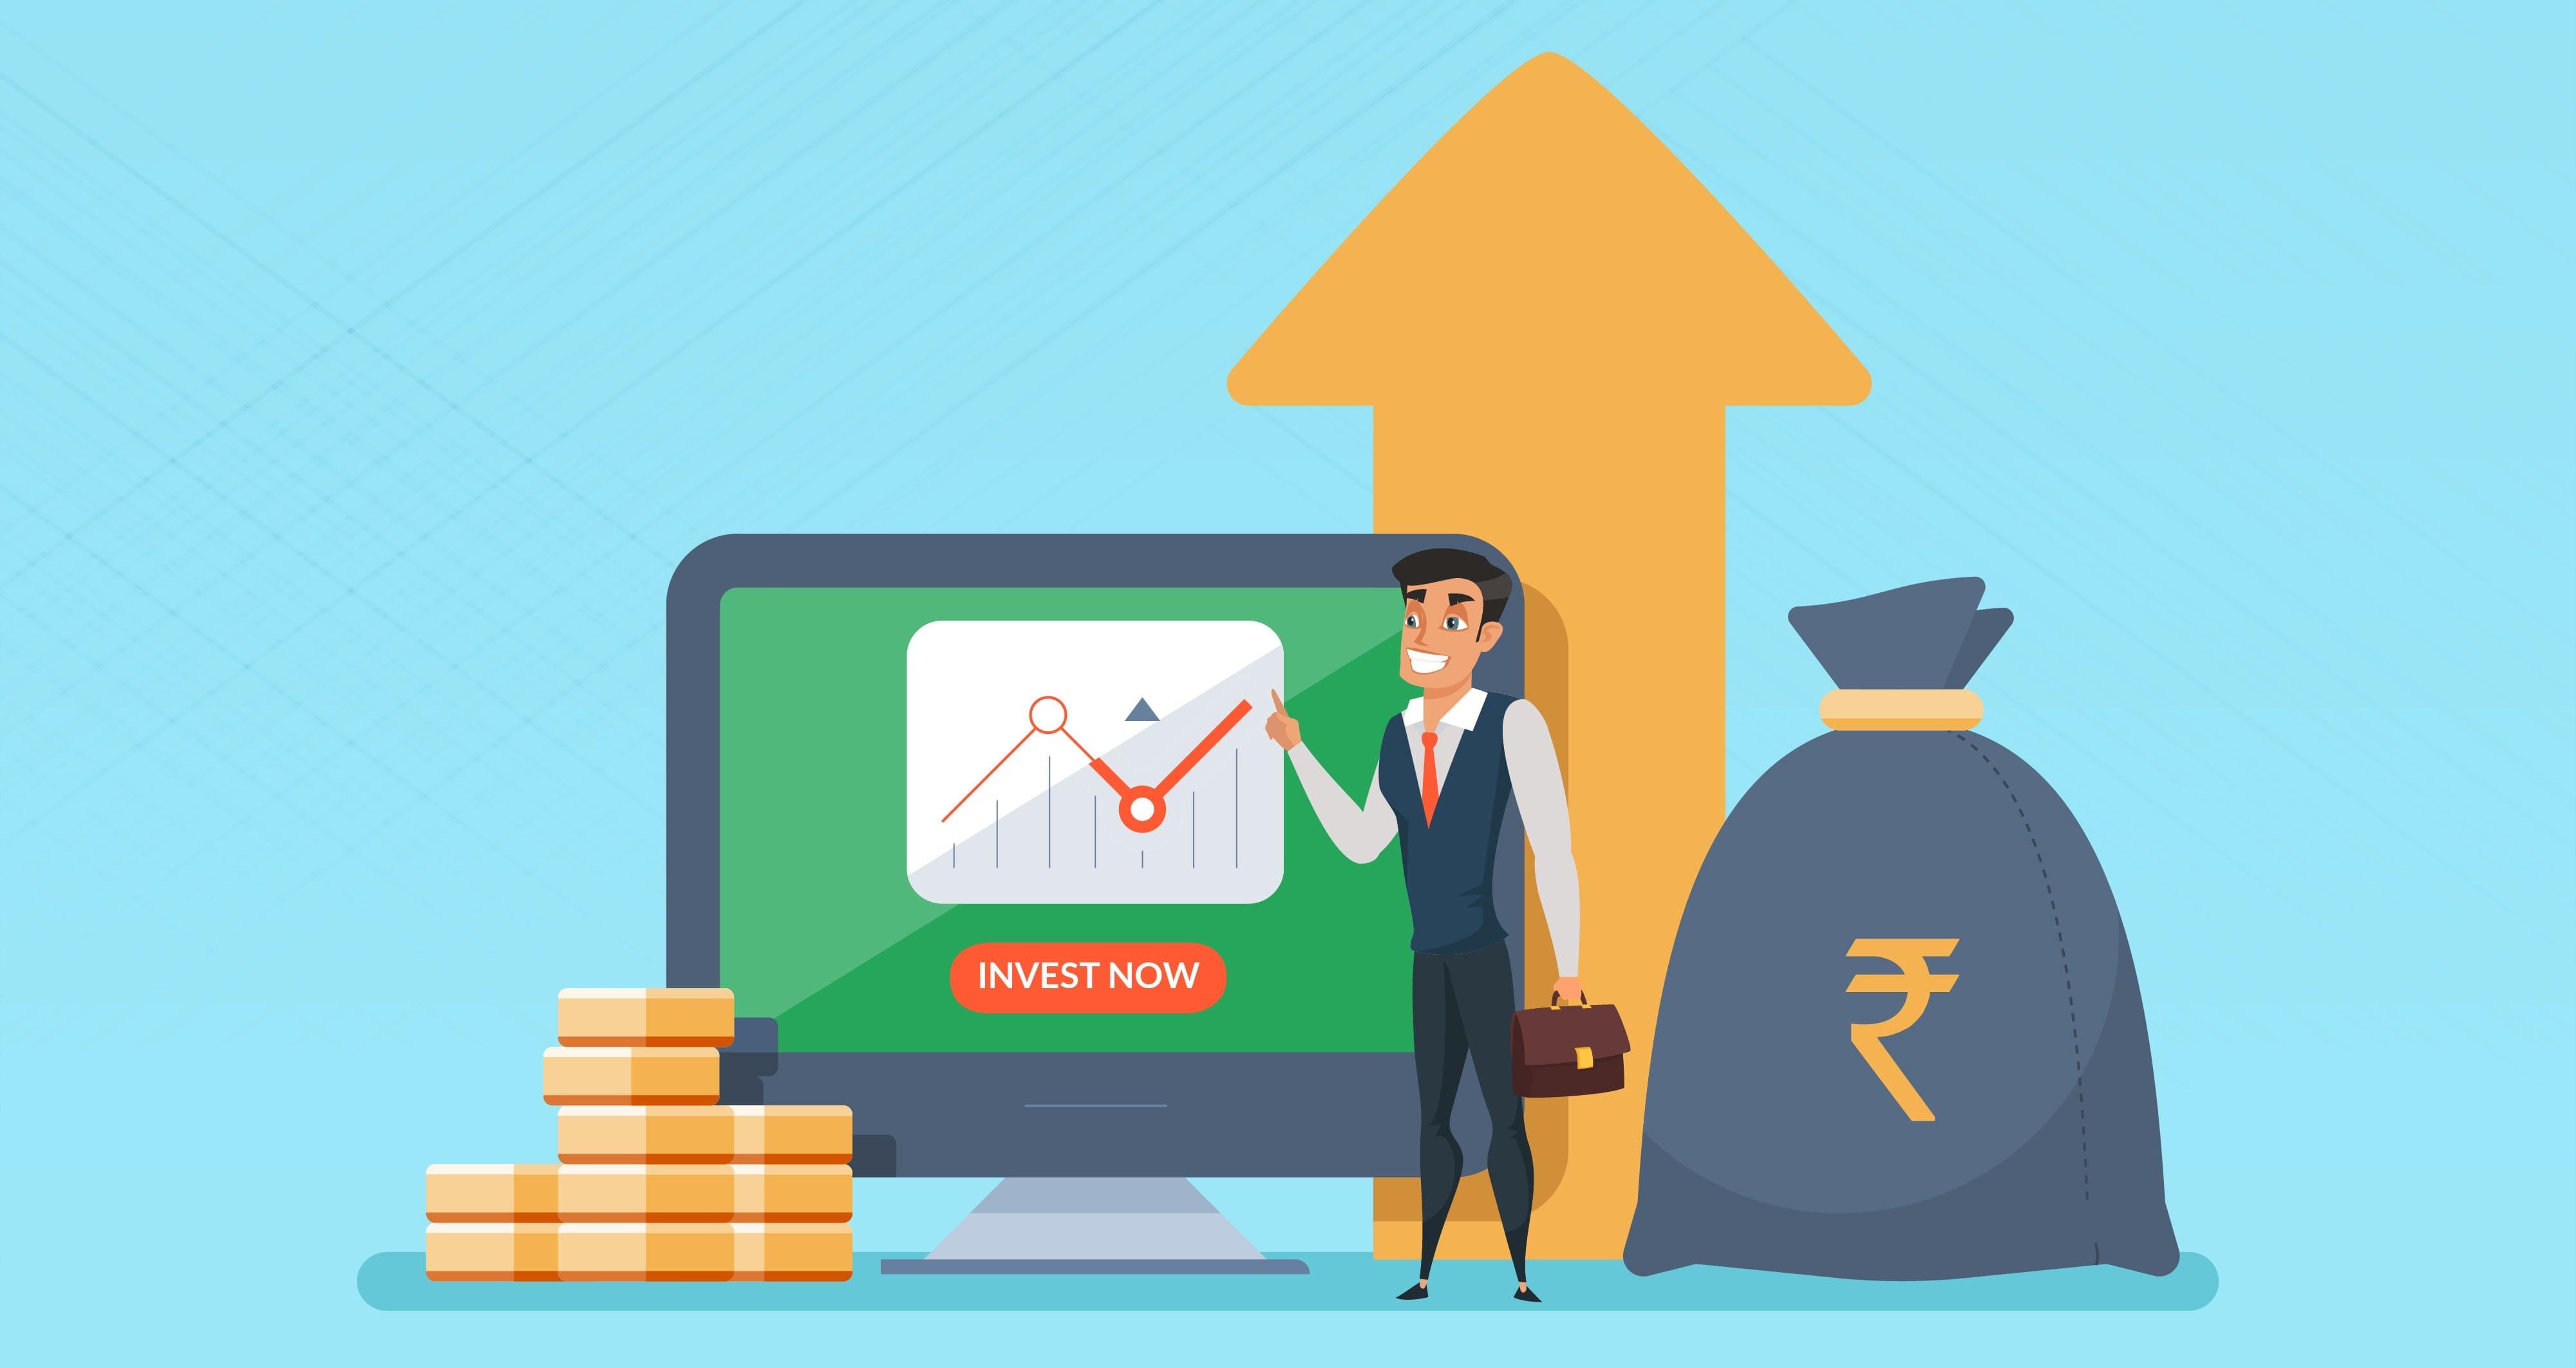 5 tips to create a balanced investment portfolio